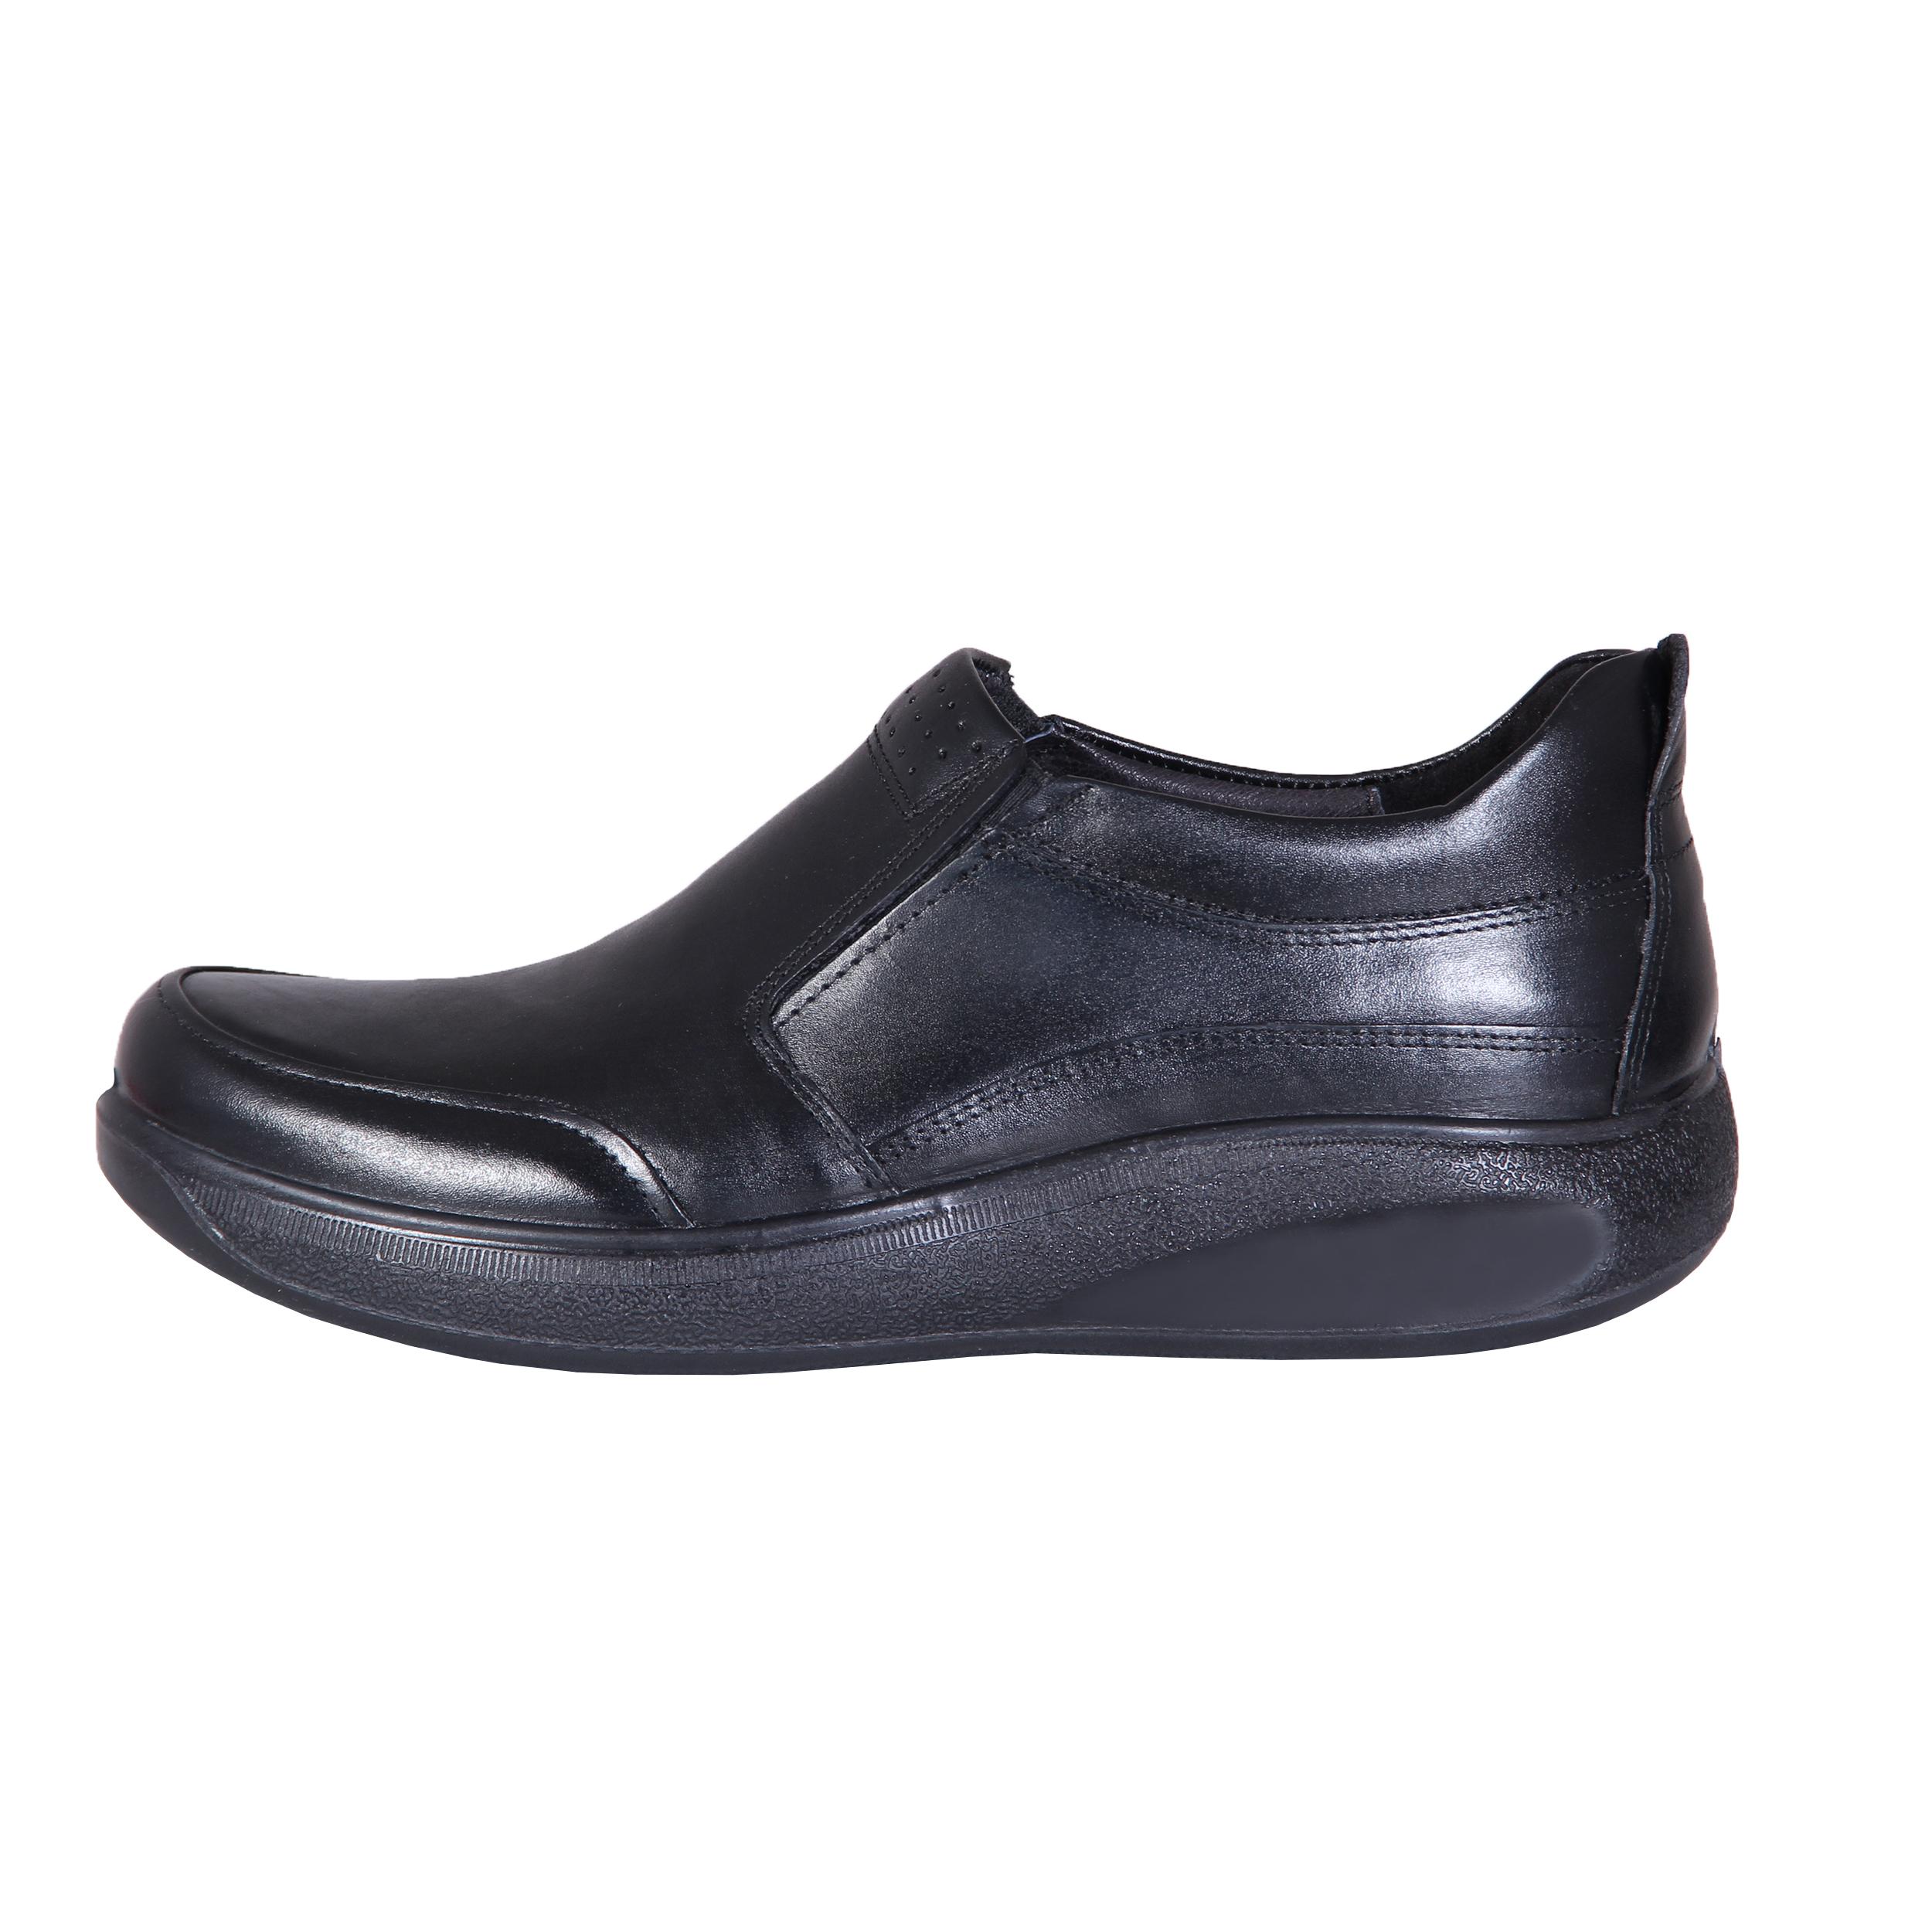 کفش روزمره مردانه شهر چرم مدل 1-P302